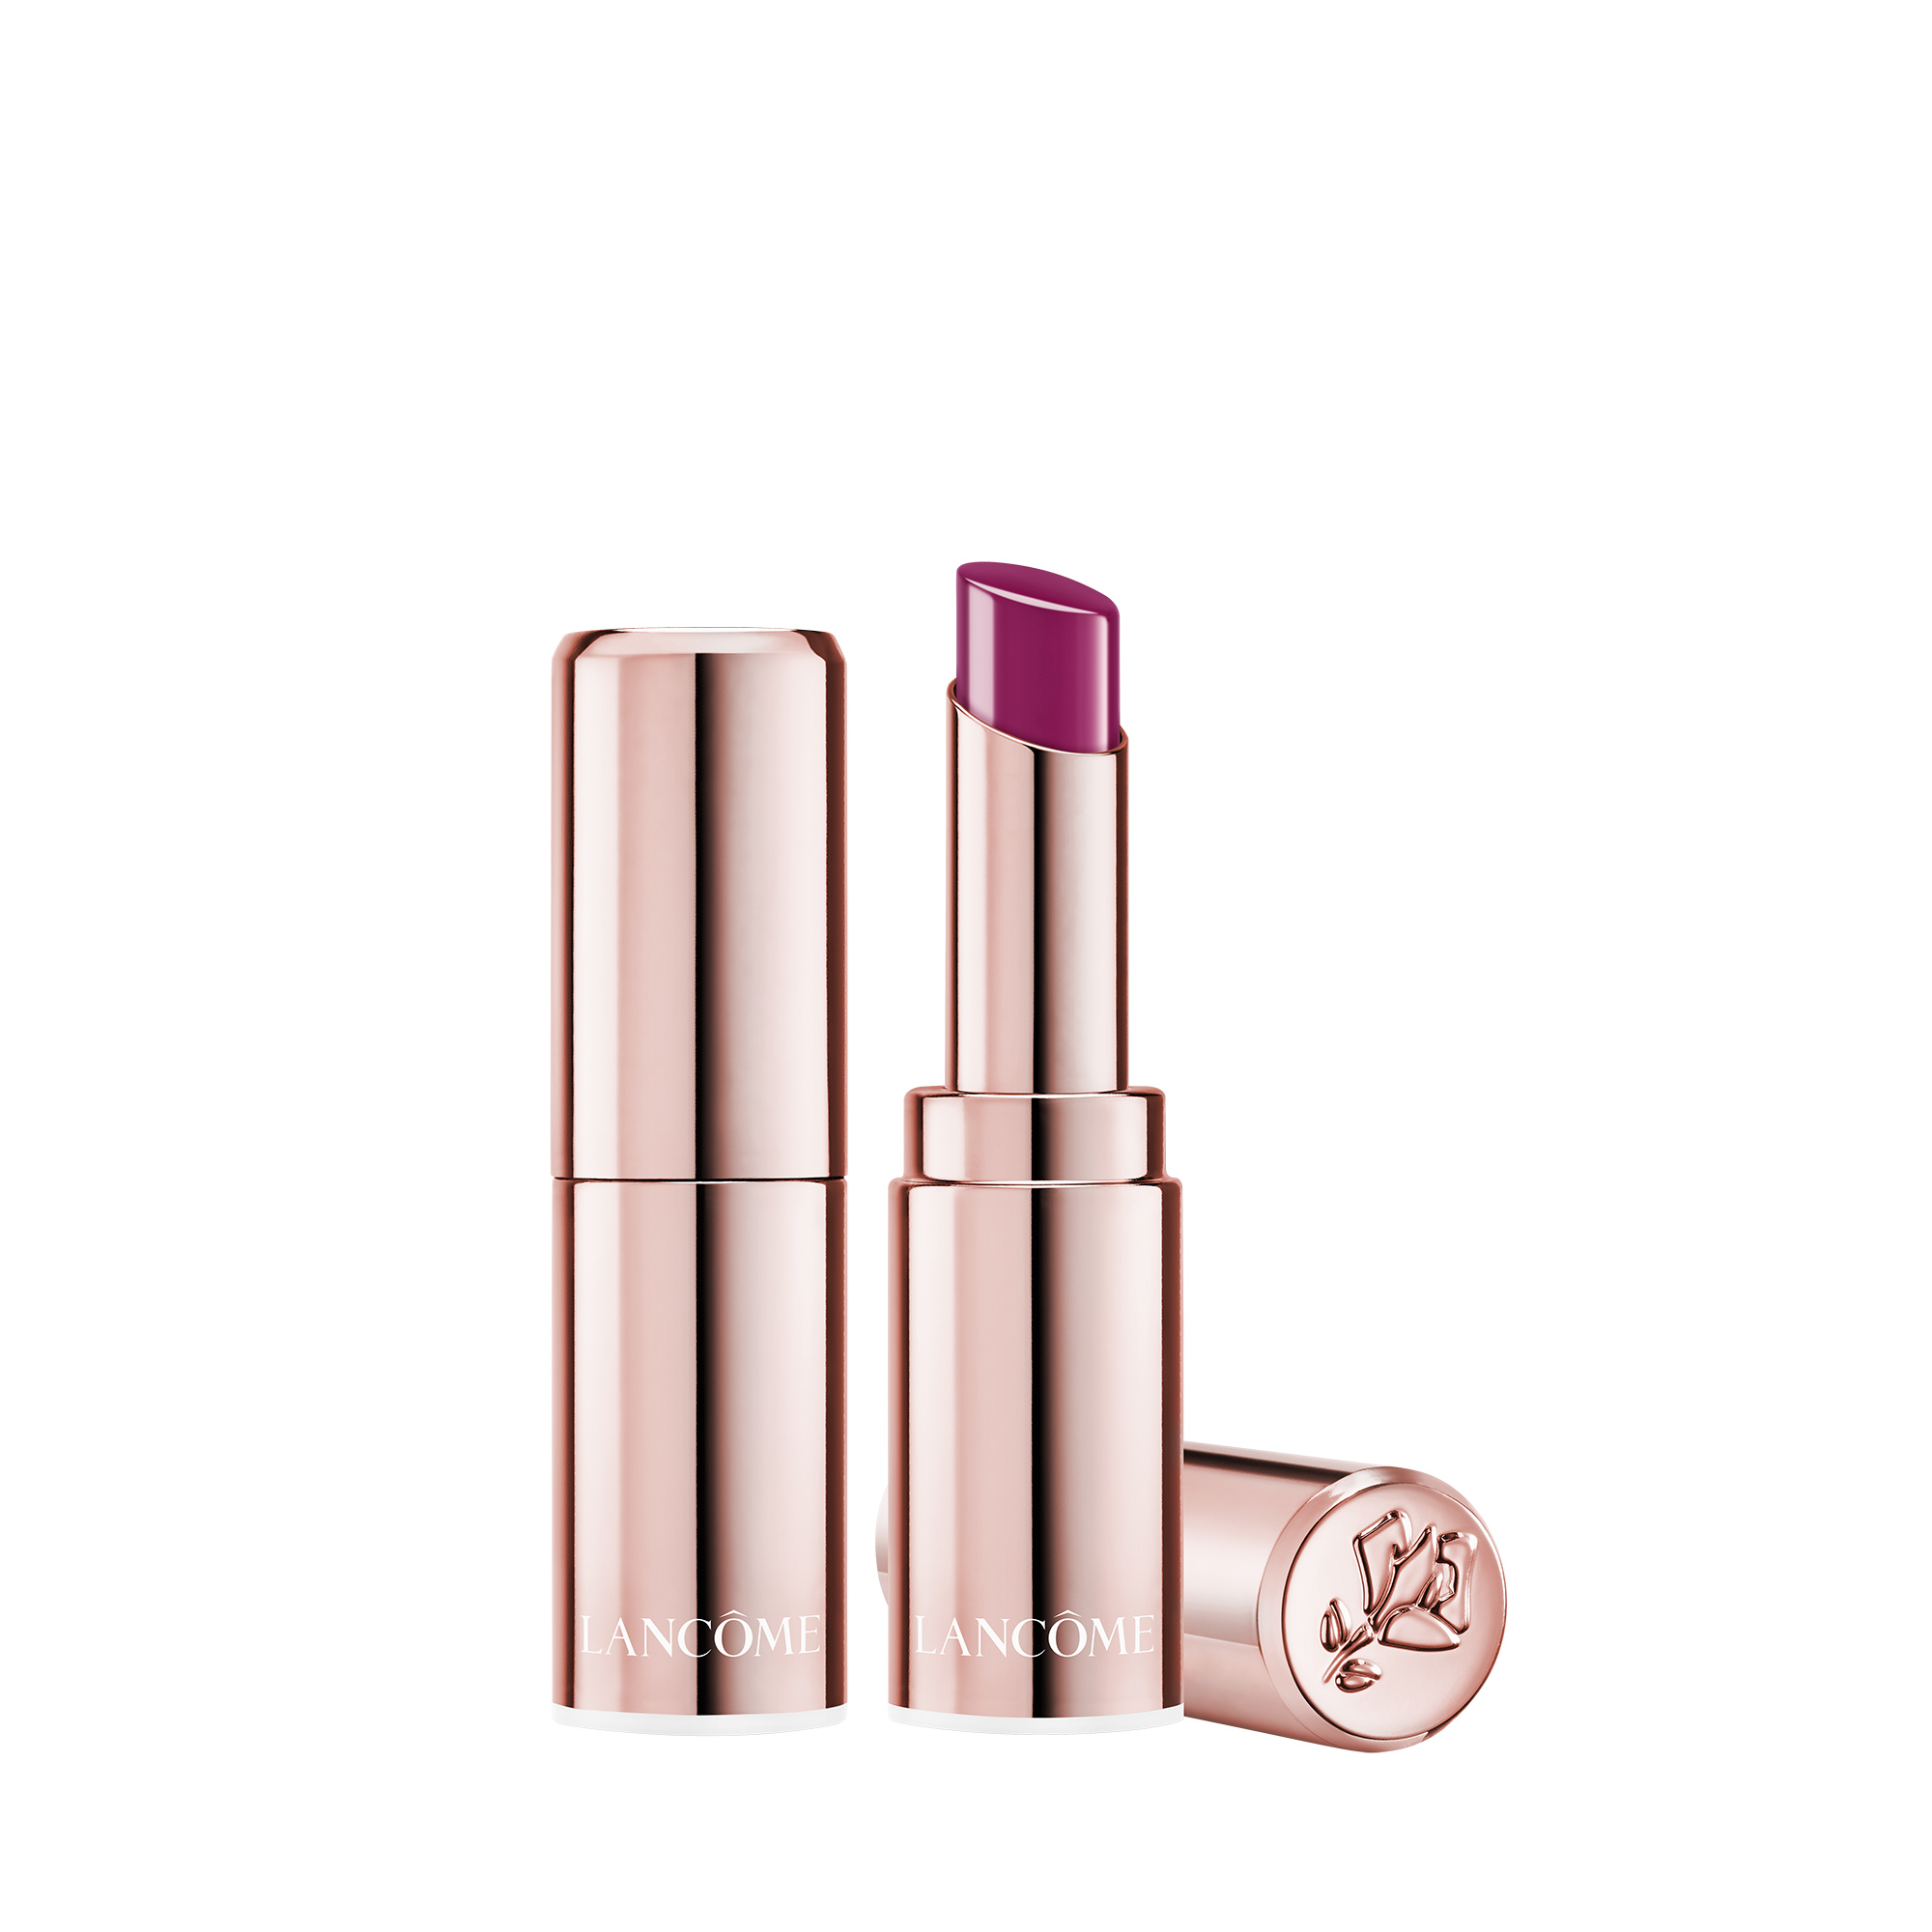 Lancôme Mademoiselle Shine Lipstick, 385